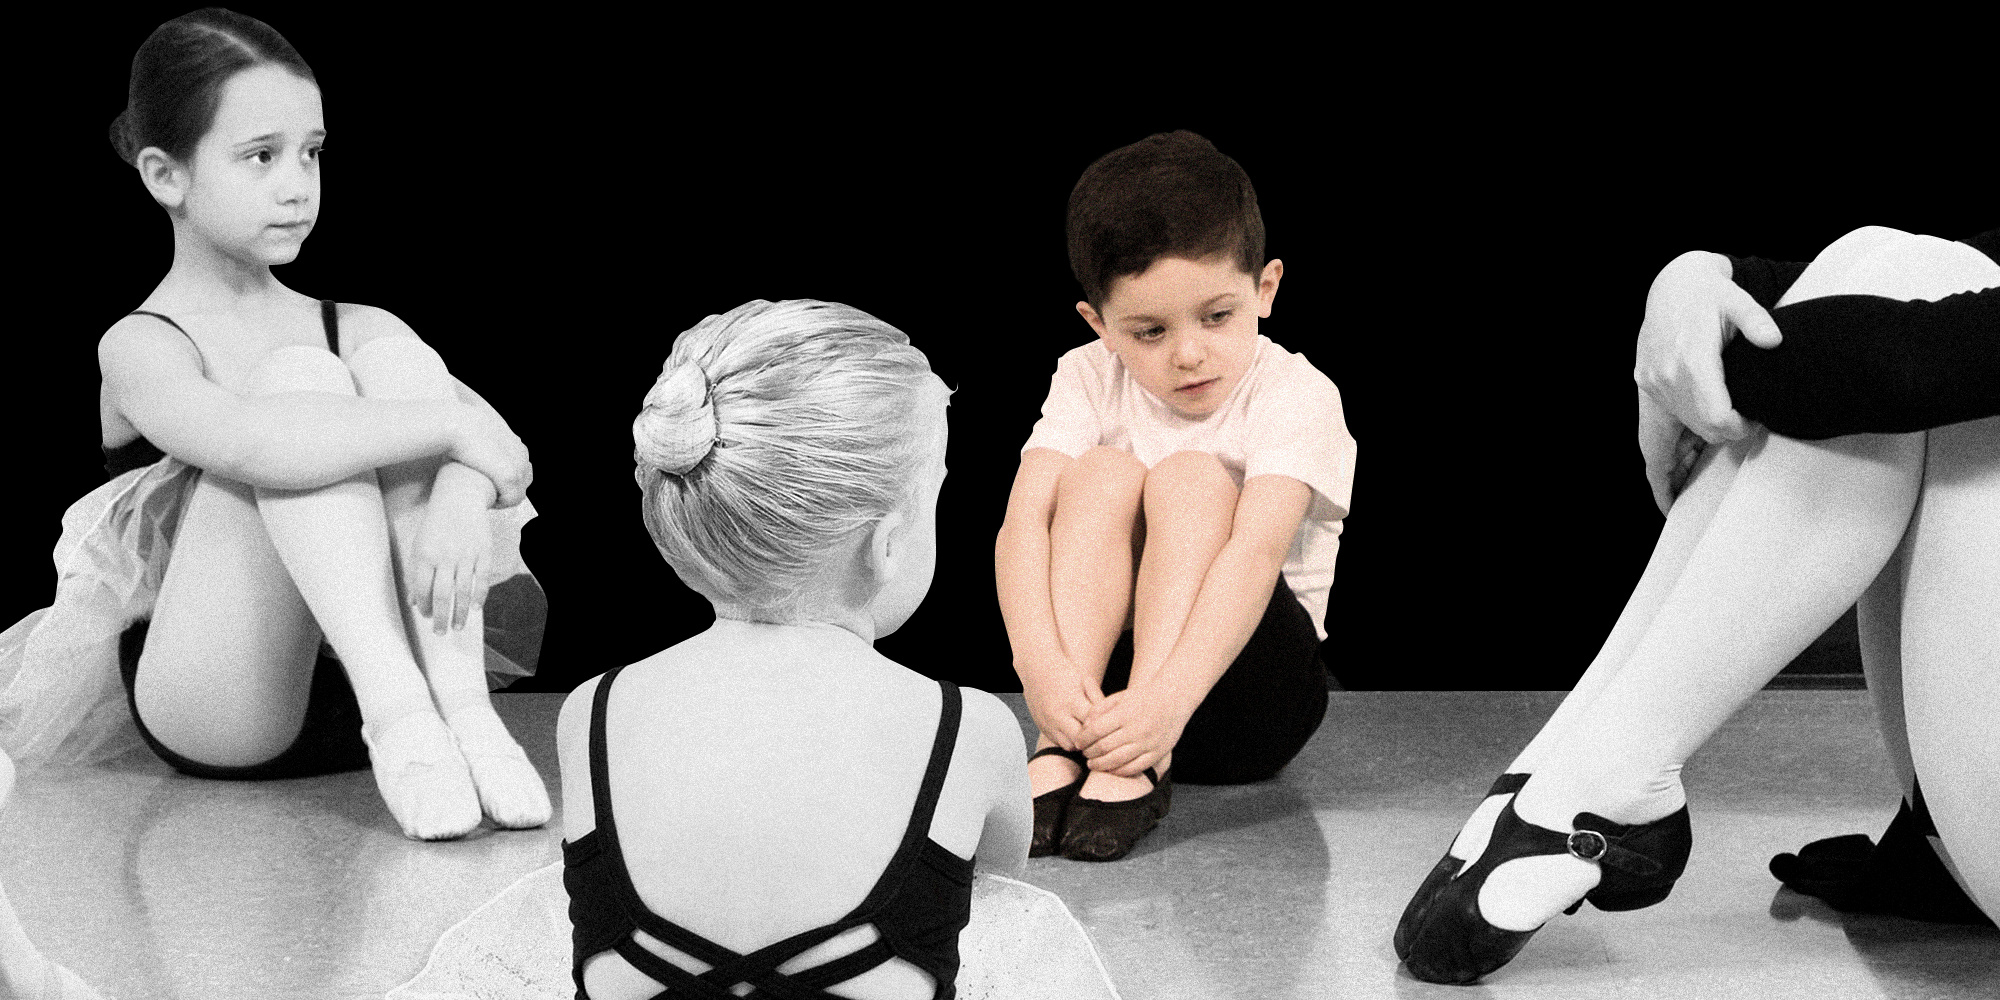 feminine, masculine, raising boys